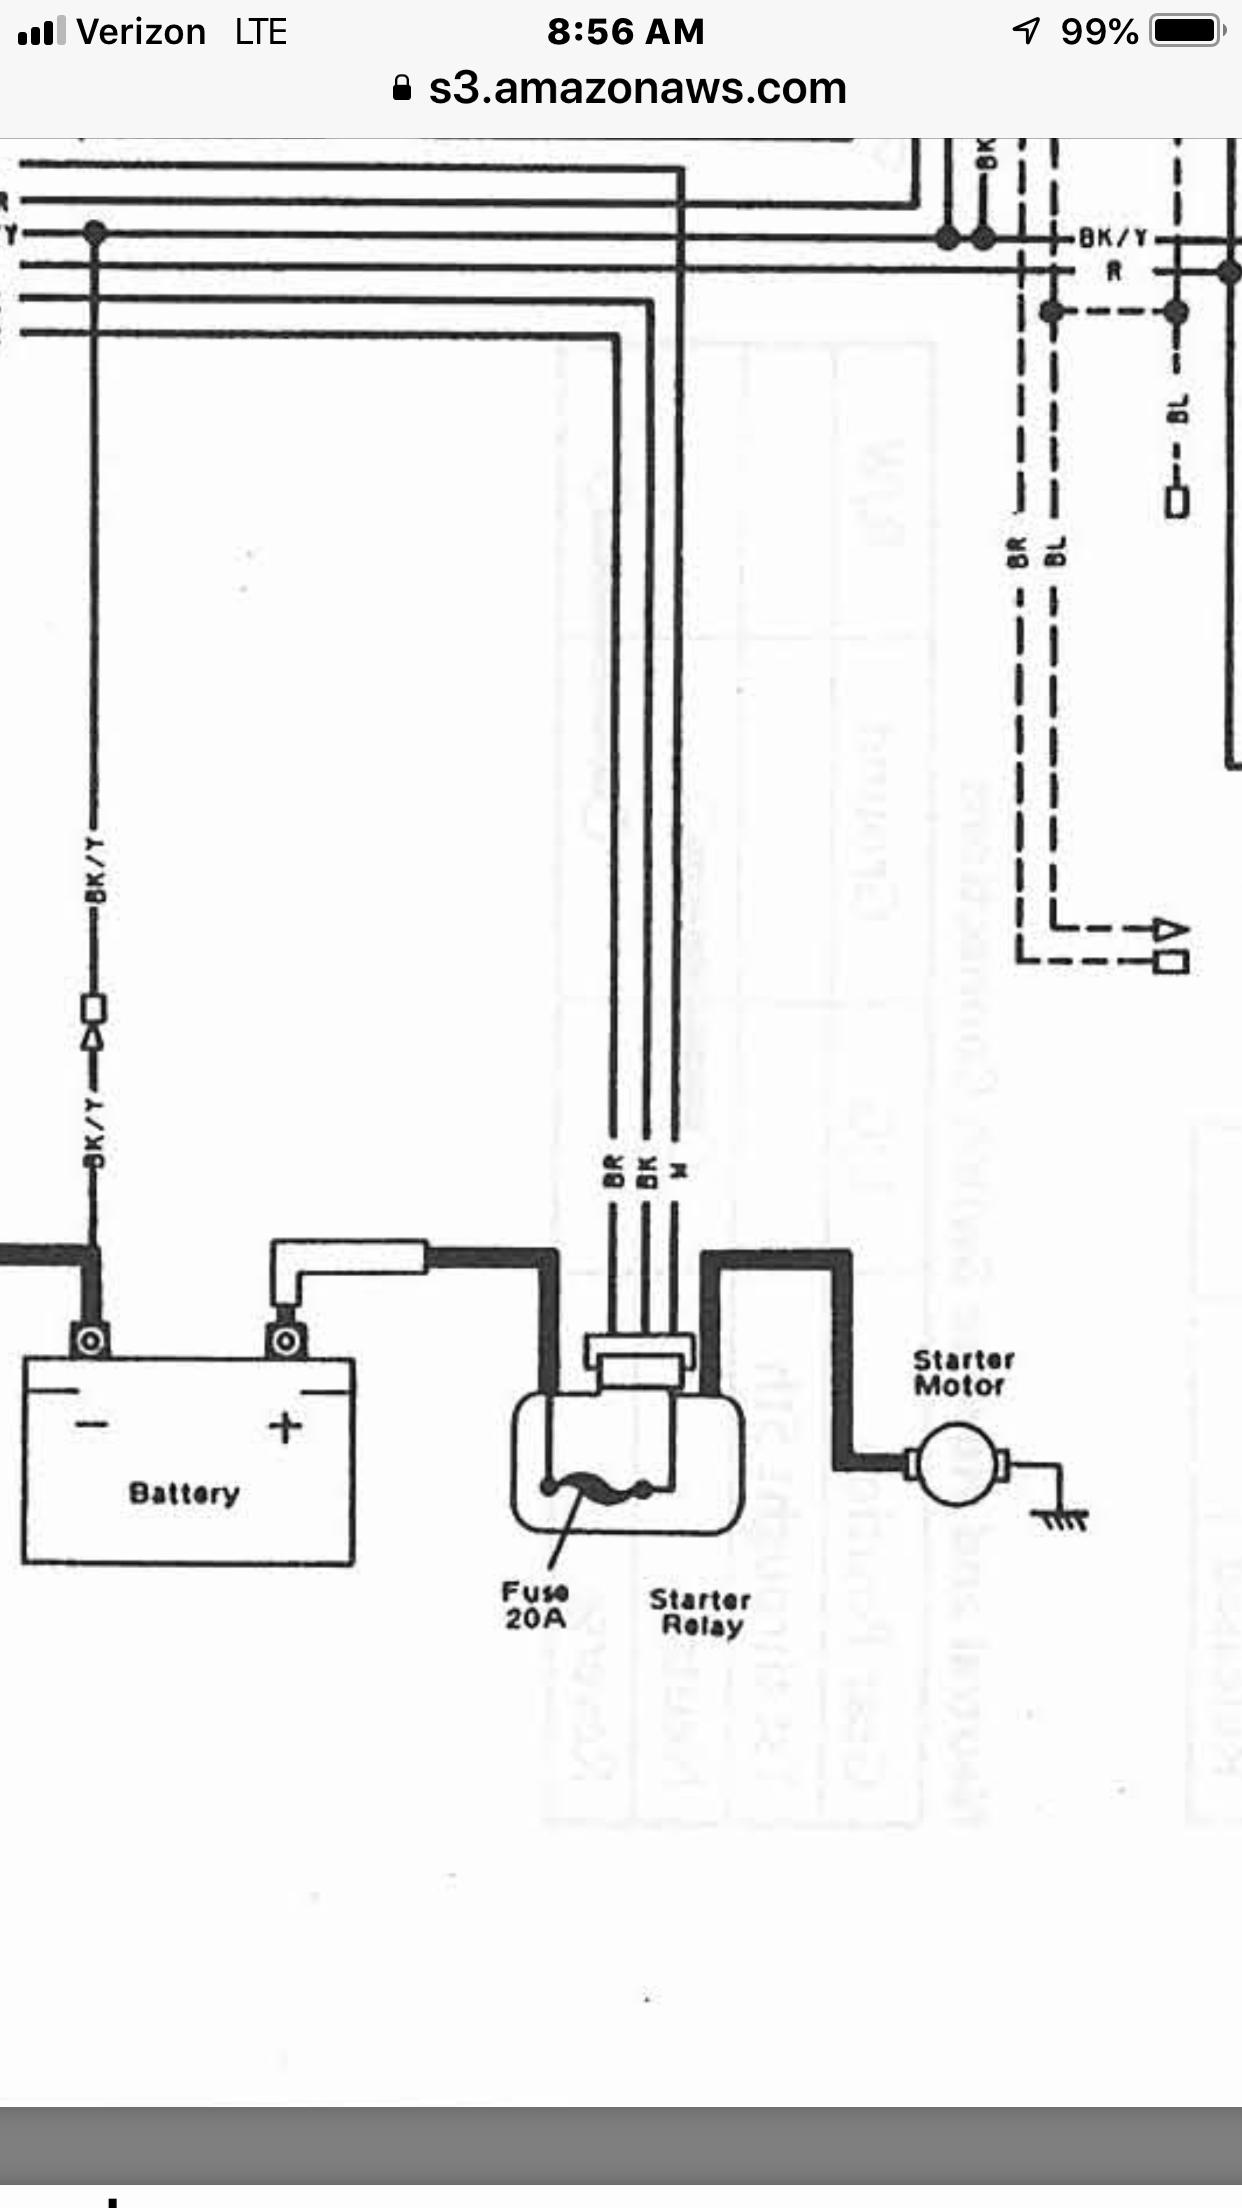 [SCHEMATICS_48IU]  1997 Kawasaki Bayou 220 Rehab - wiring question - Kawasaki ATV Forum -  QUADCRAZY | Kawasaki 220 Wiring Diagram |  | QuadCRAZY